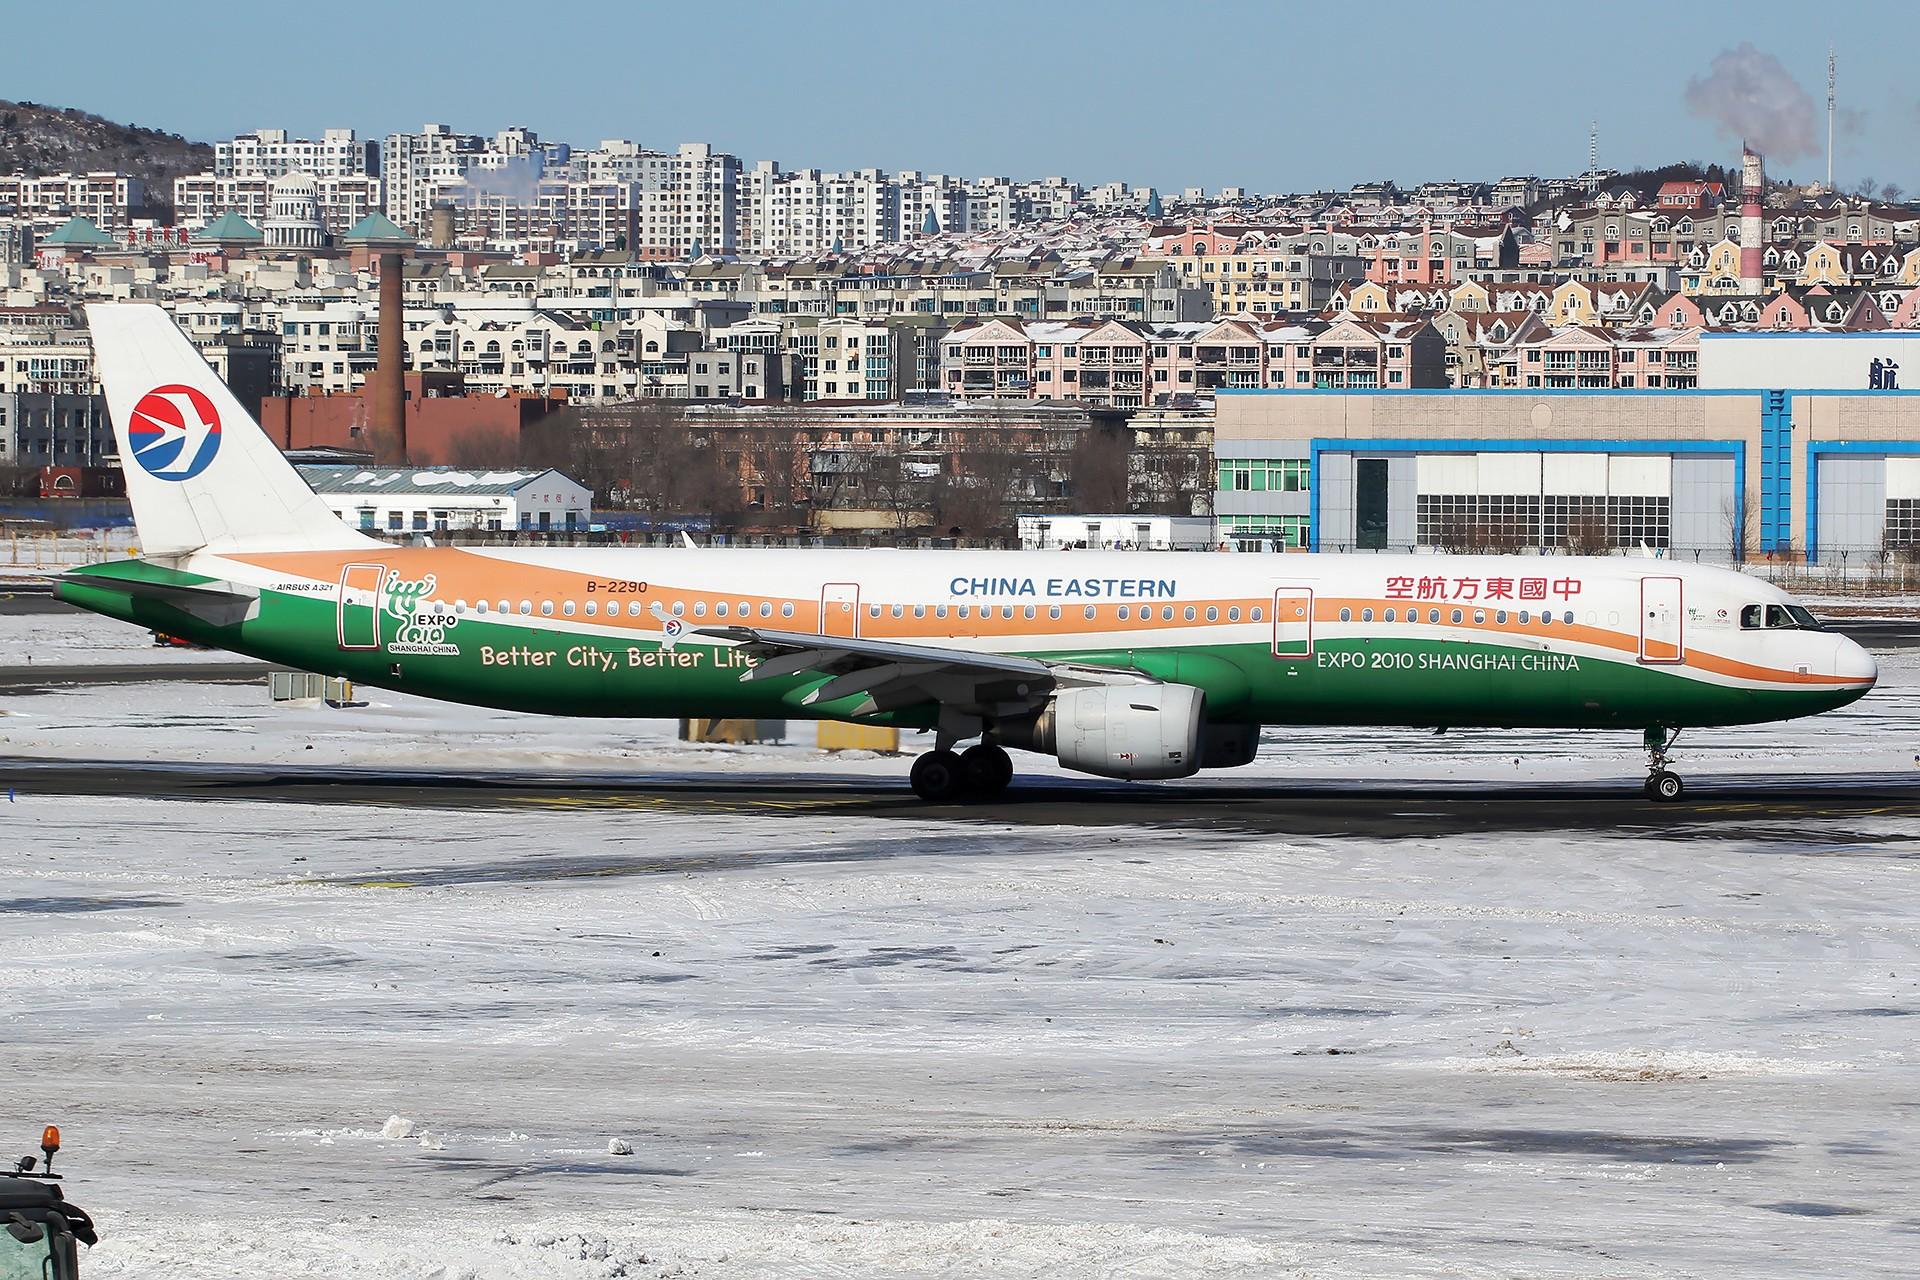 Re:[原创][原创][DLC]。。。DLC雪。。。 AIRBUS A321-200 B-2290 中国大连国际机场